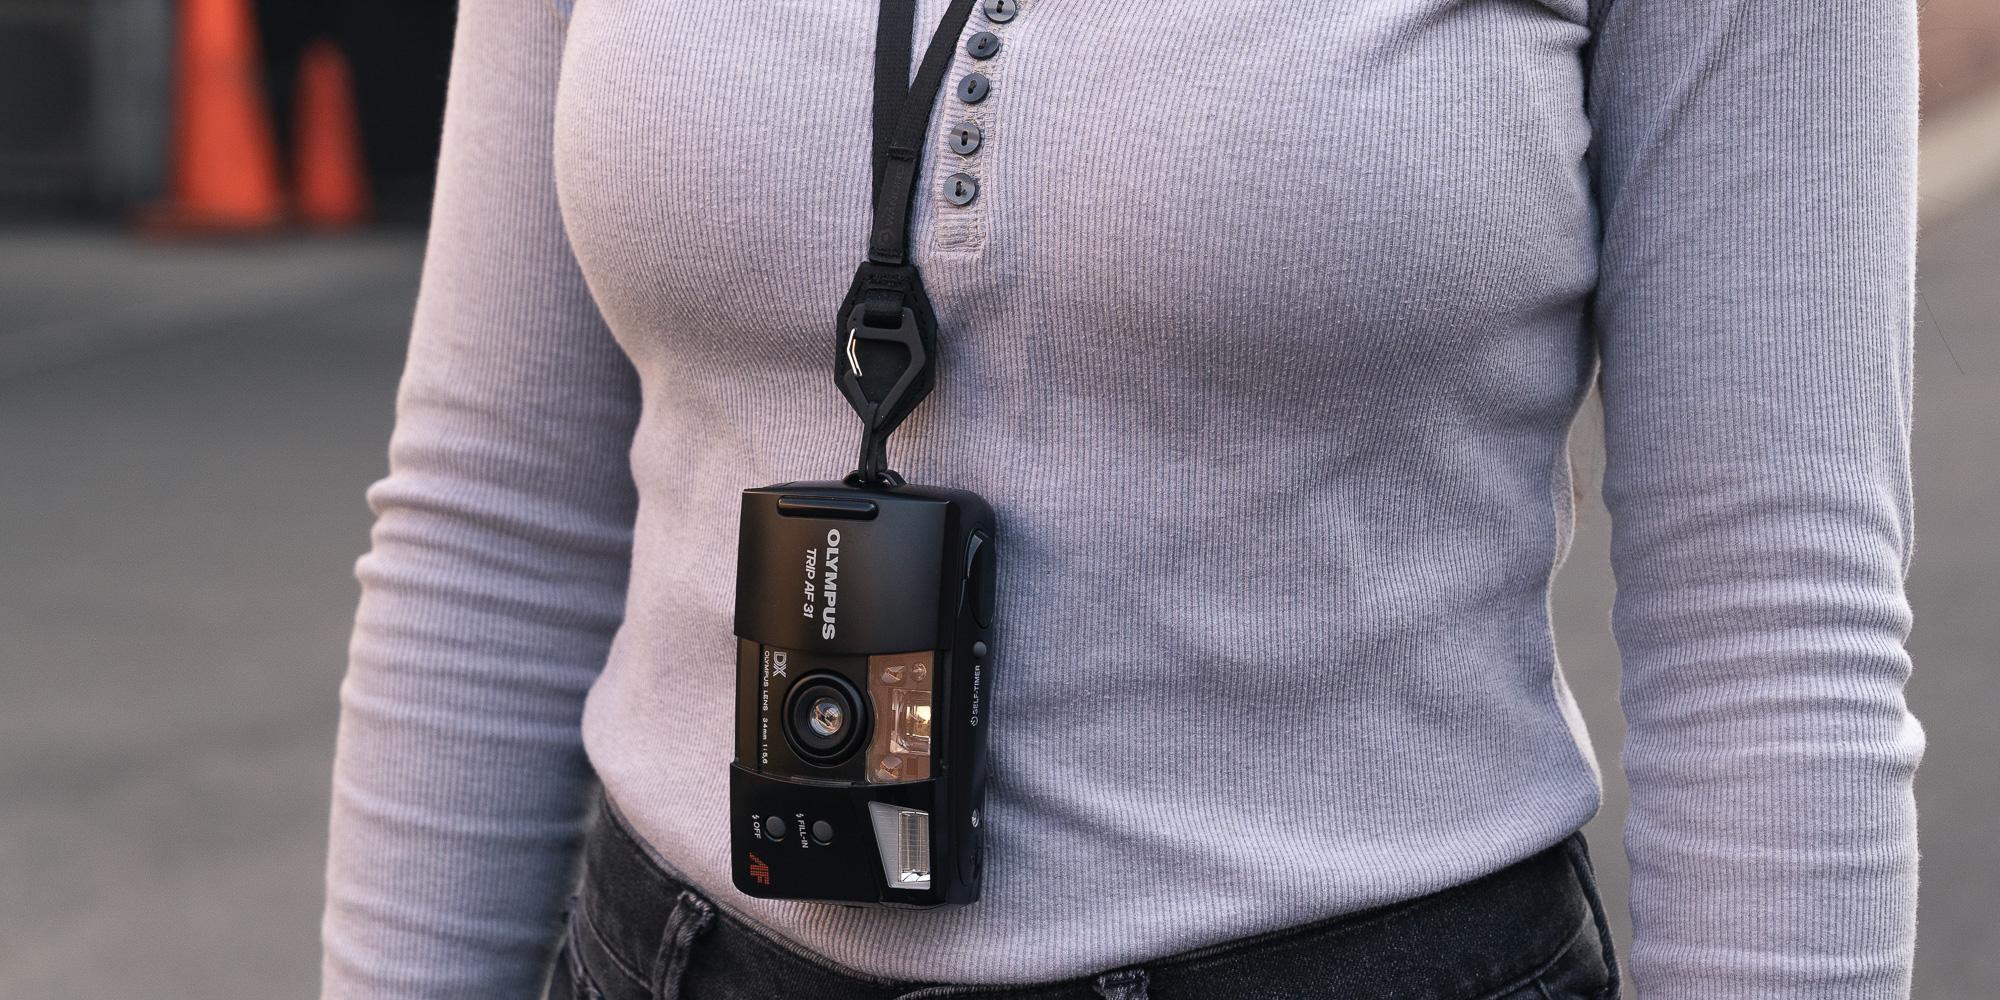 Wandrd Neck Camera Strap - Don't miss important moments